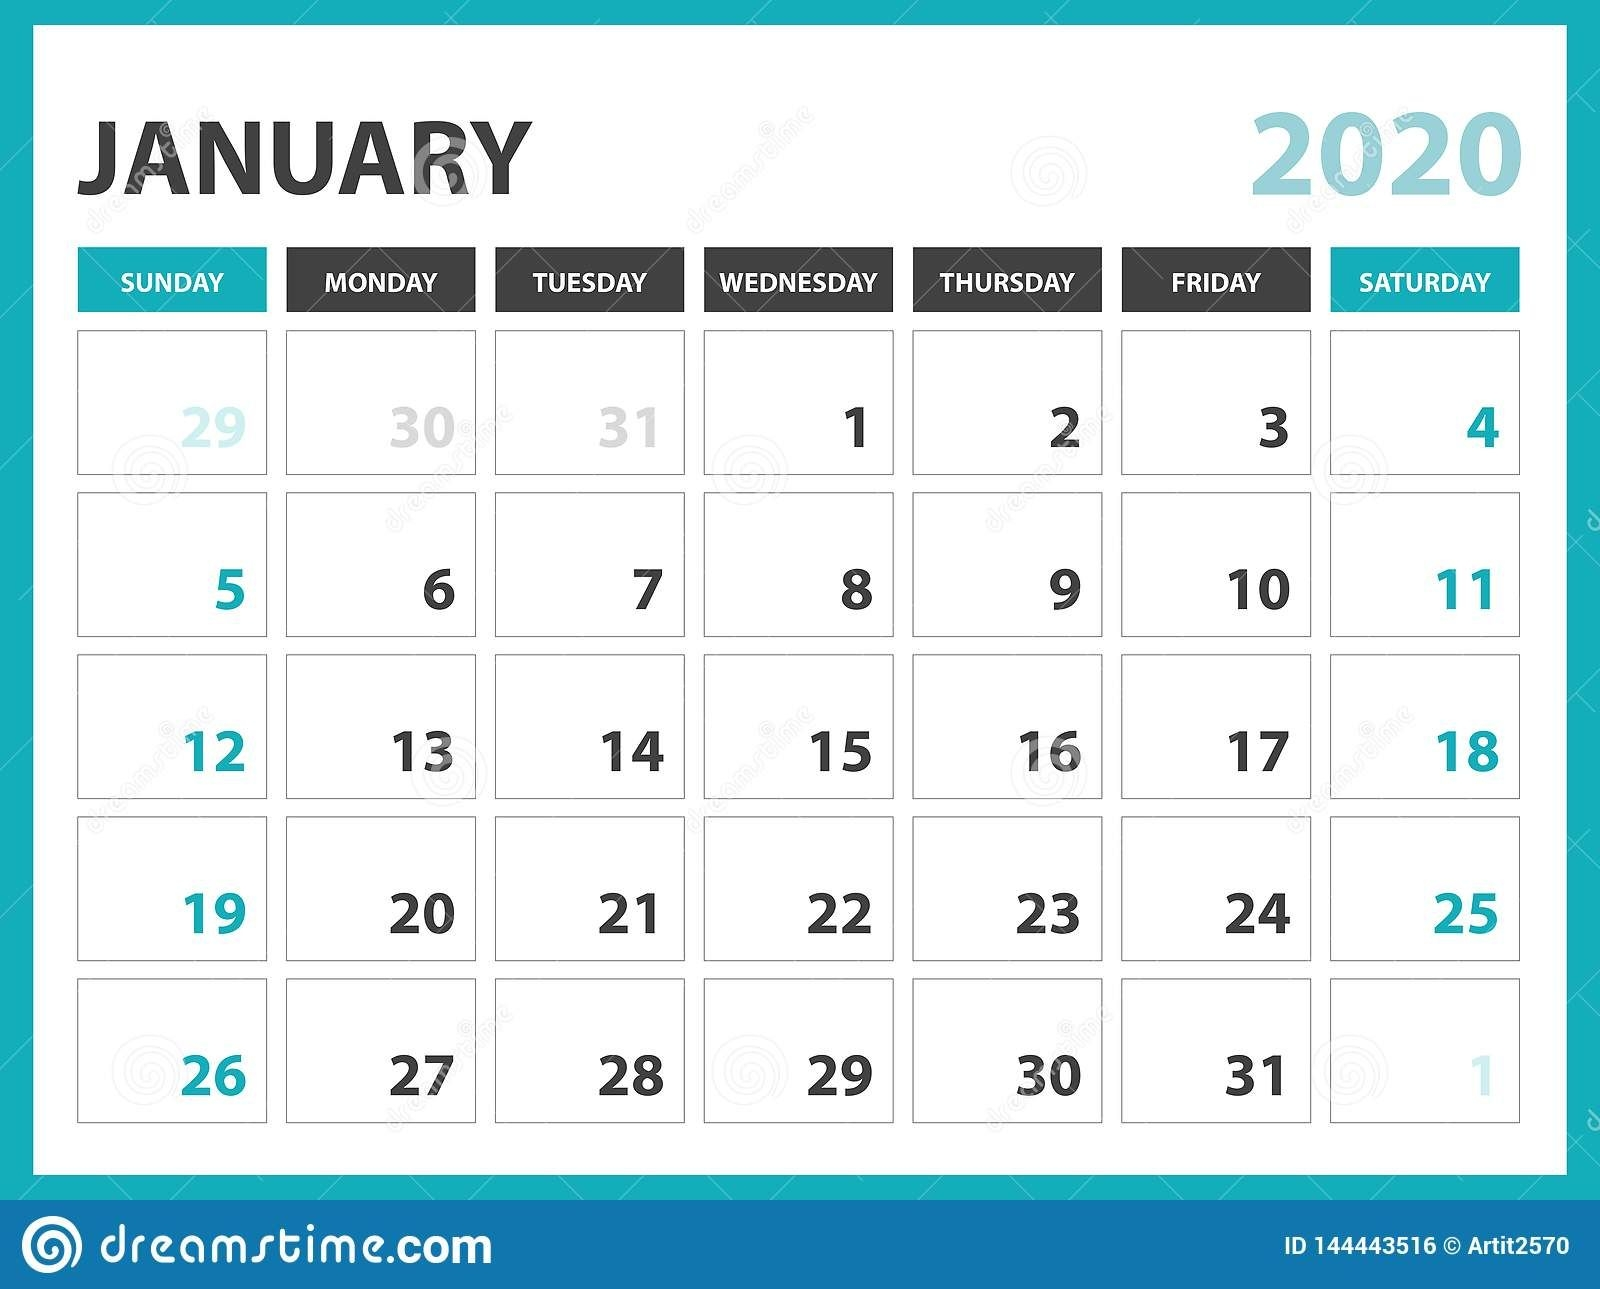 desk calendar layout size 8 x 6 inch, january 2020